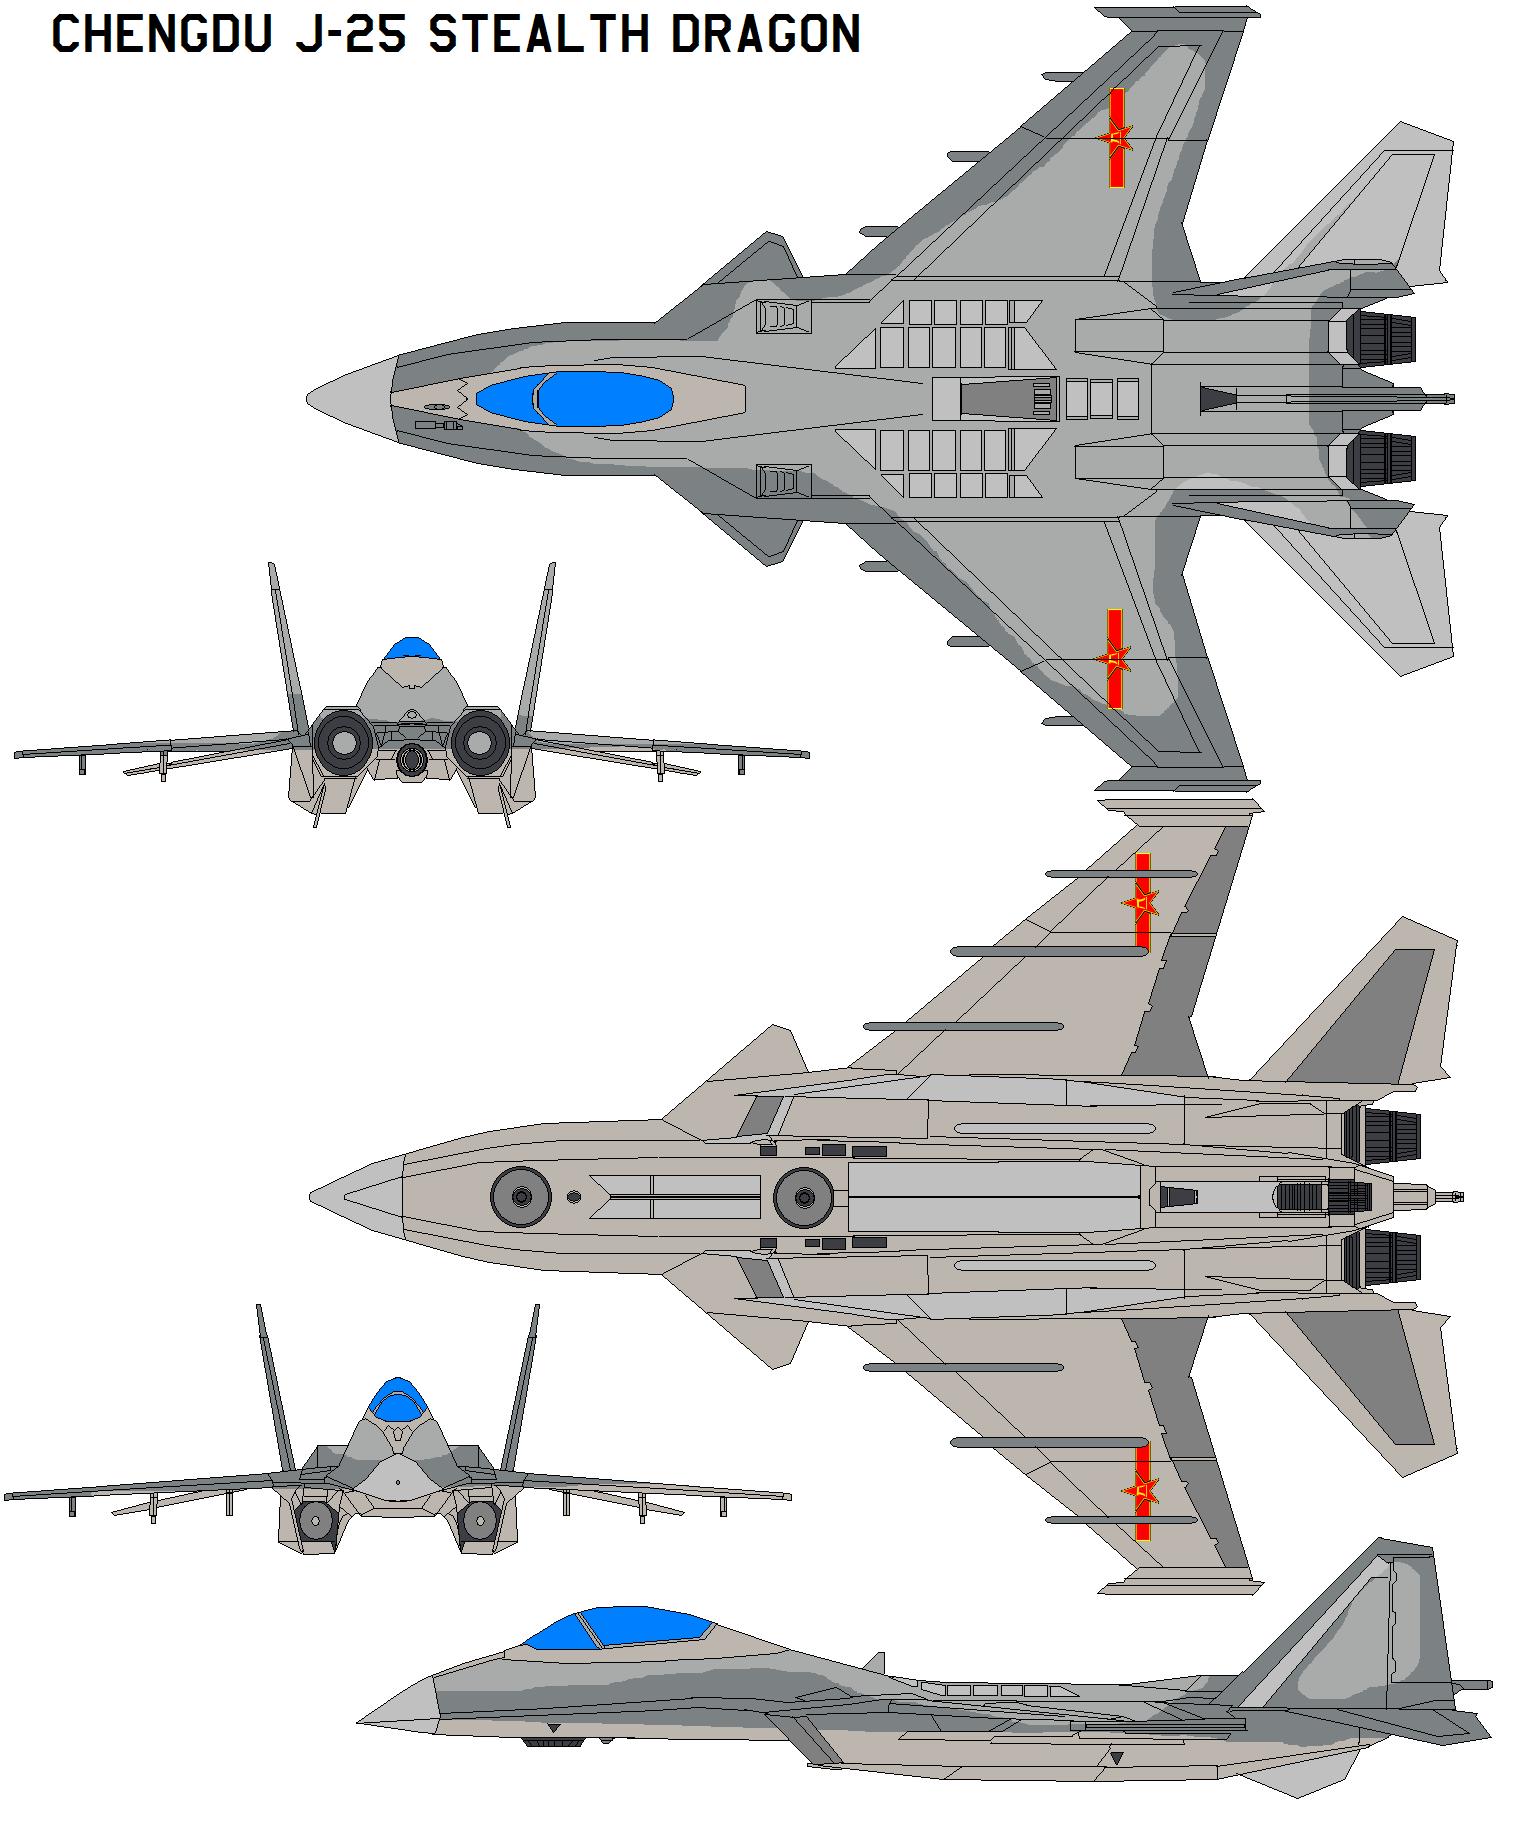 Chengdu J-25 stealth Dragon